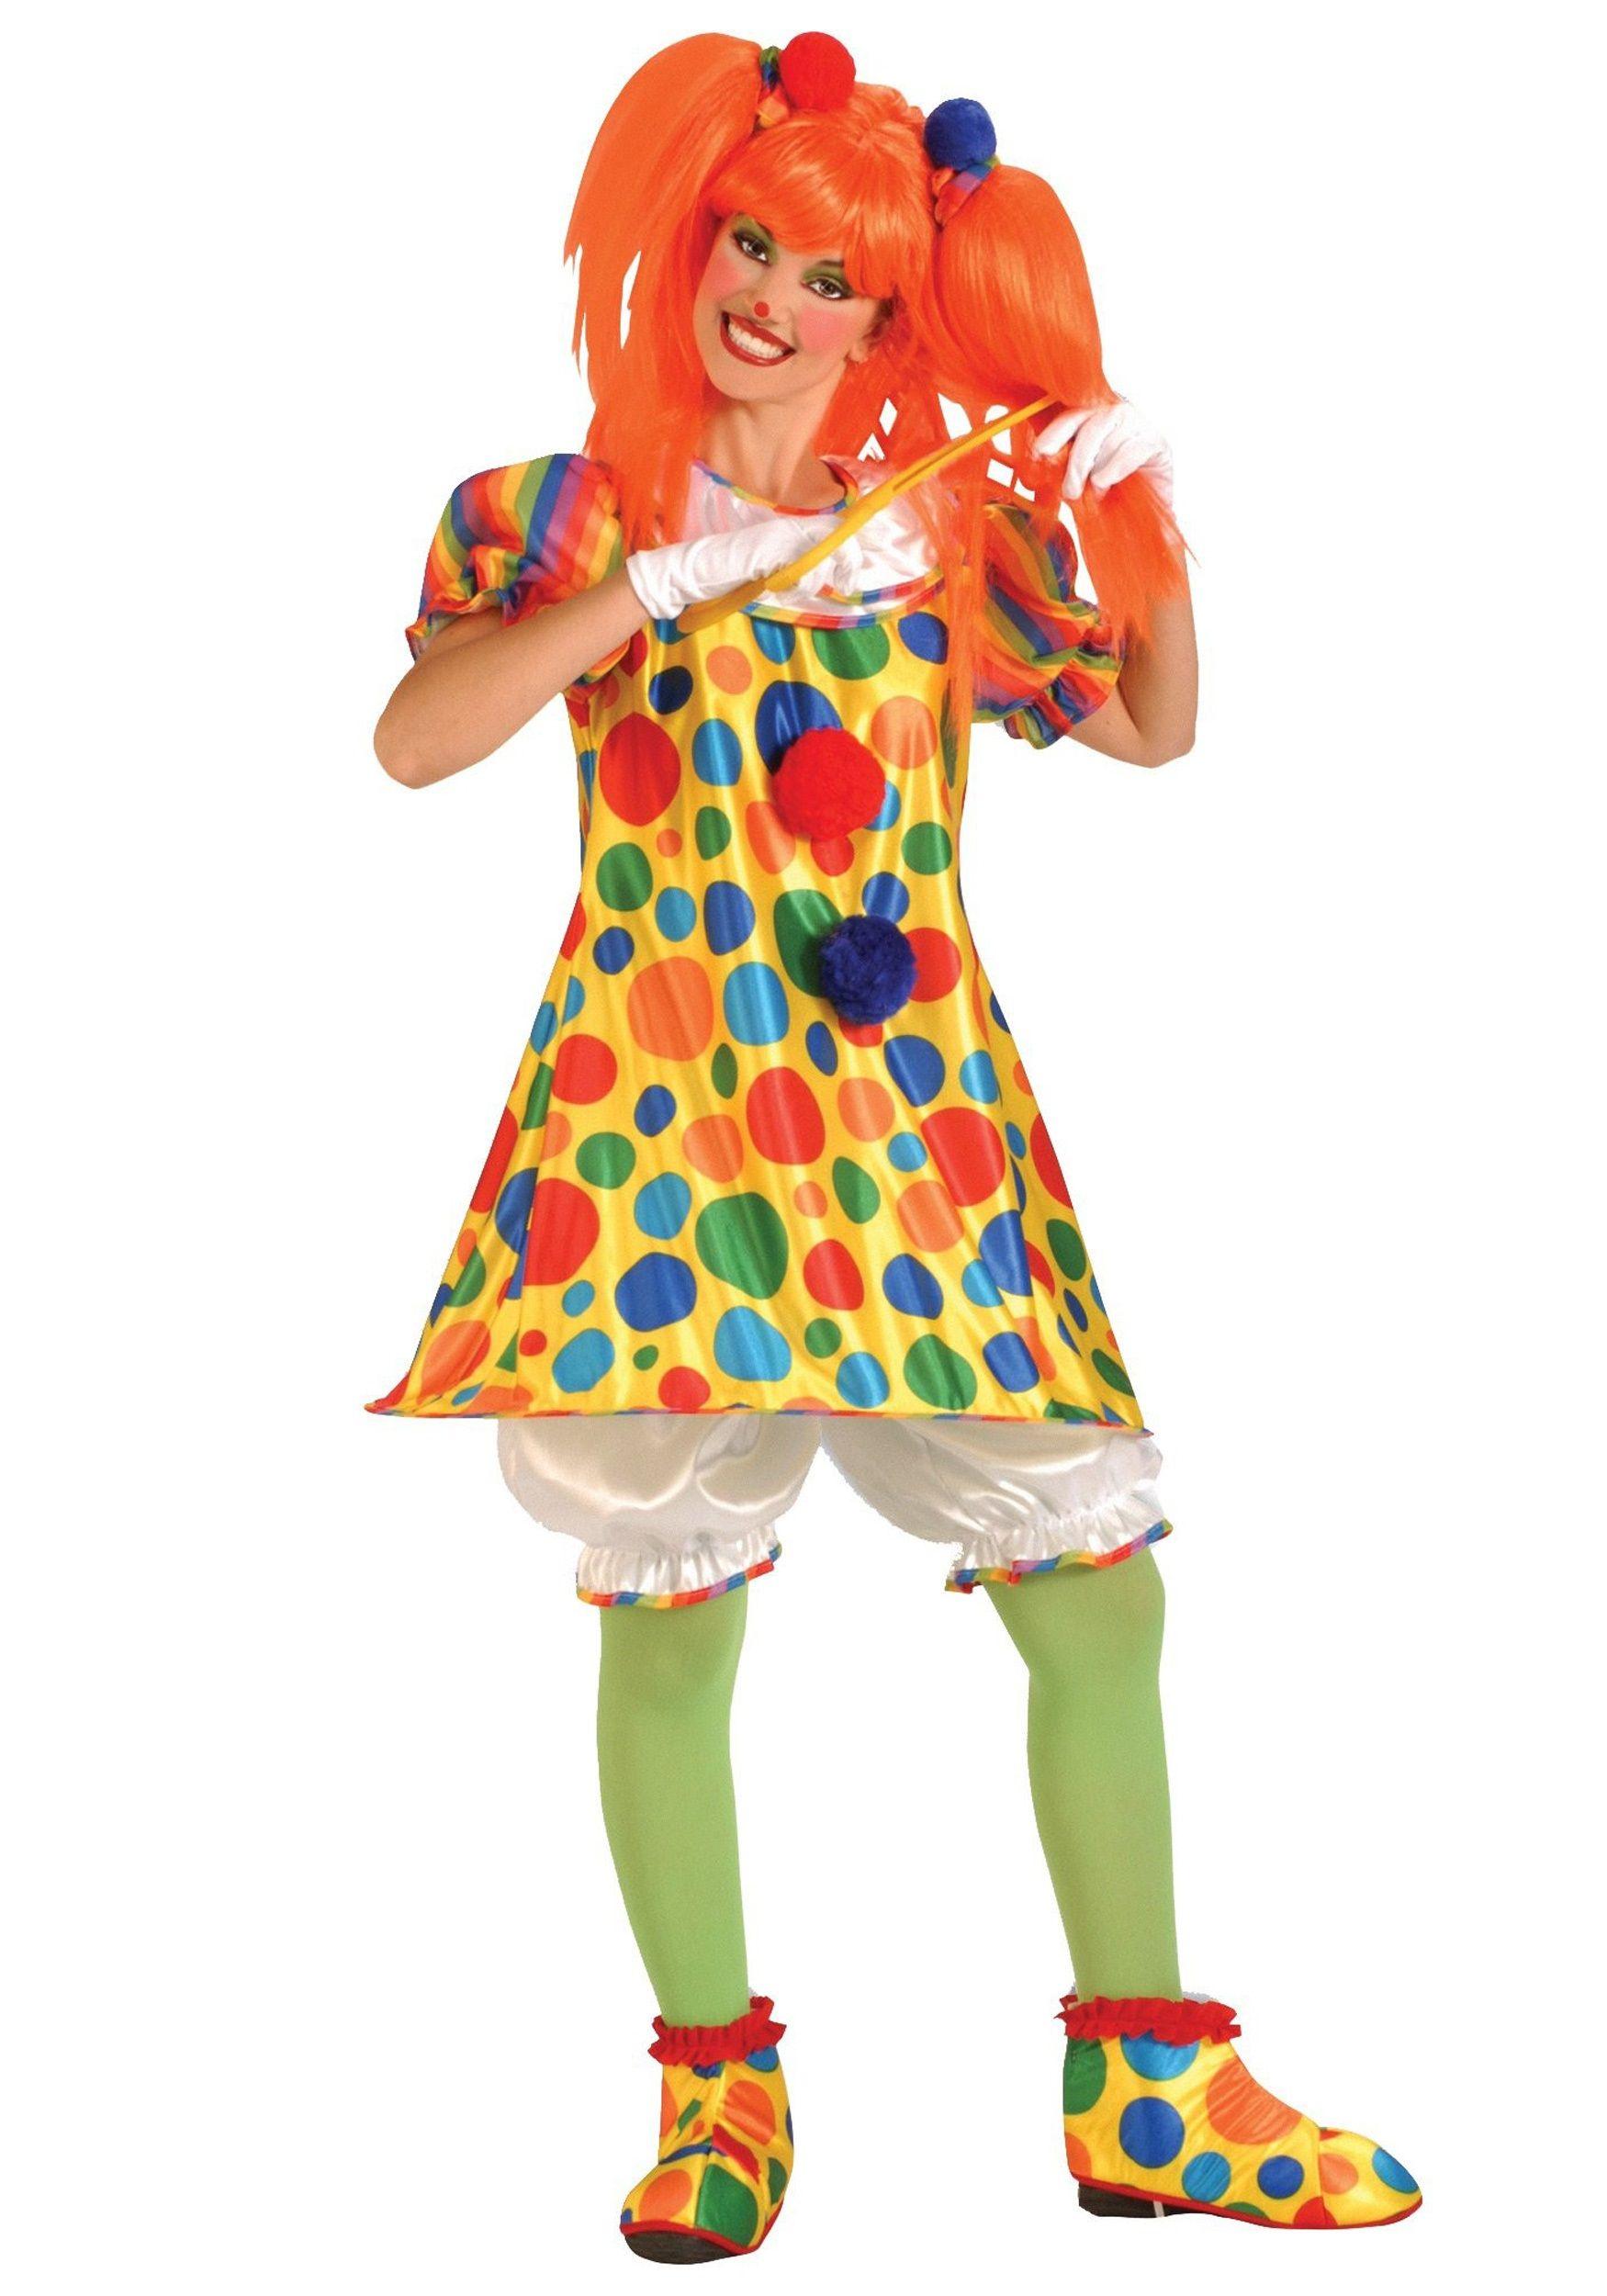 woman costumes - Girl Clown Halloween Costumes